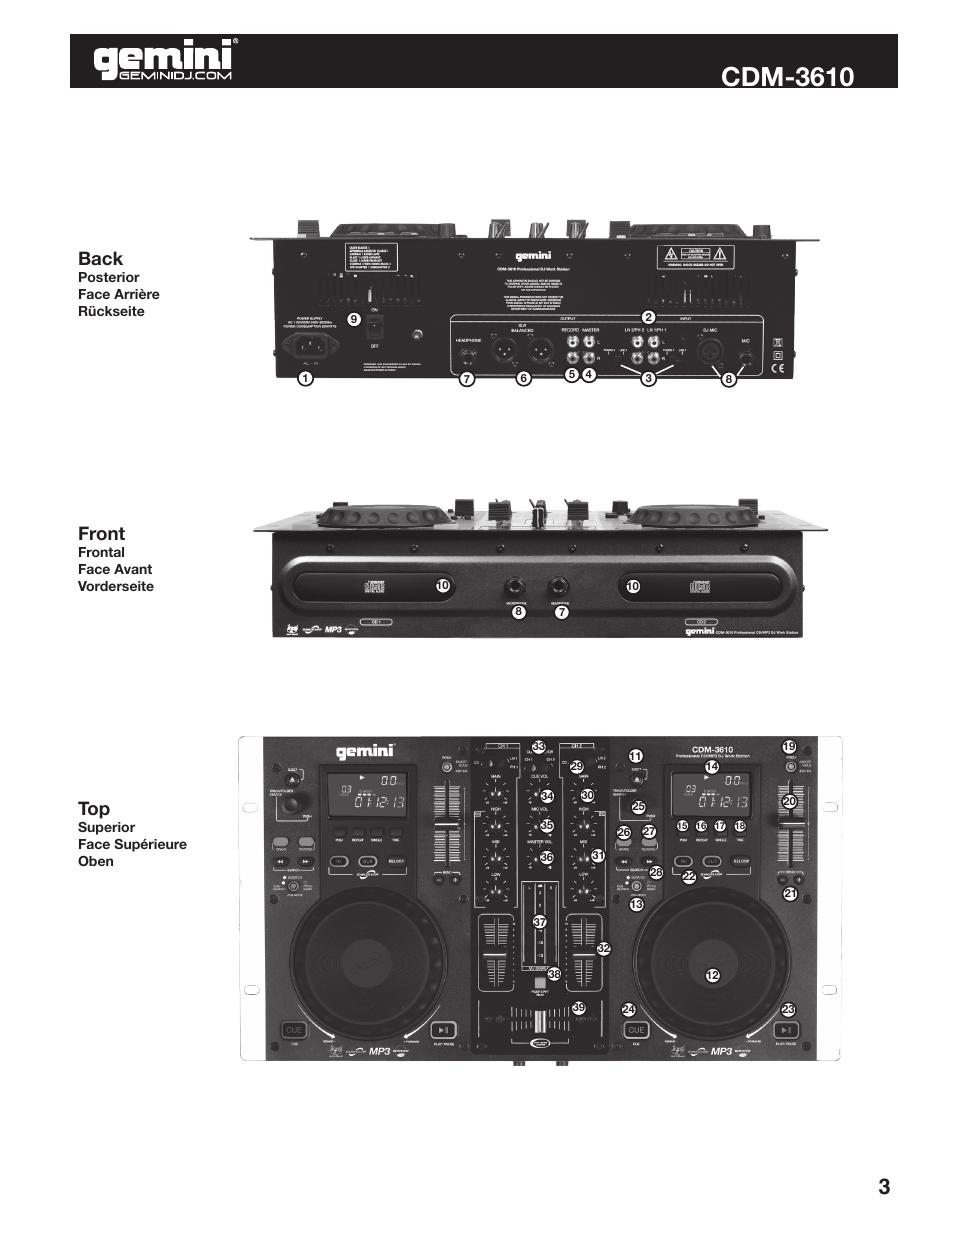 Cdm-3610, back, front | gemini cdm-3610 user manual | page 3 / 25.